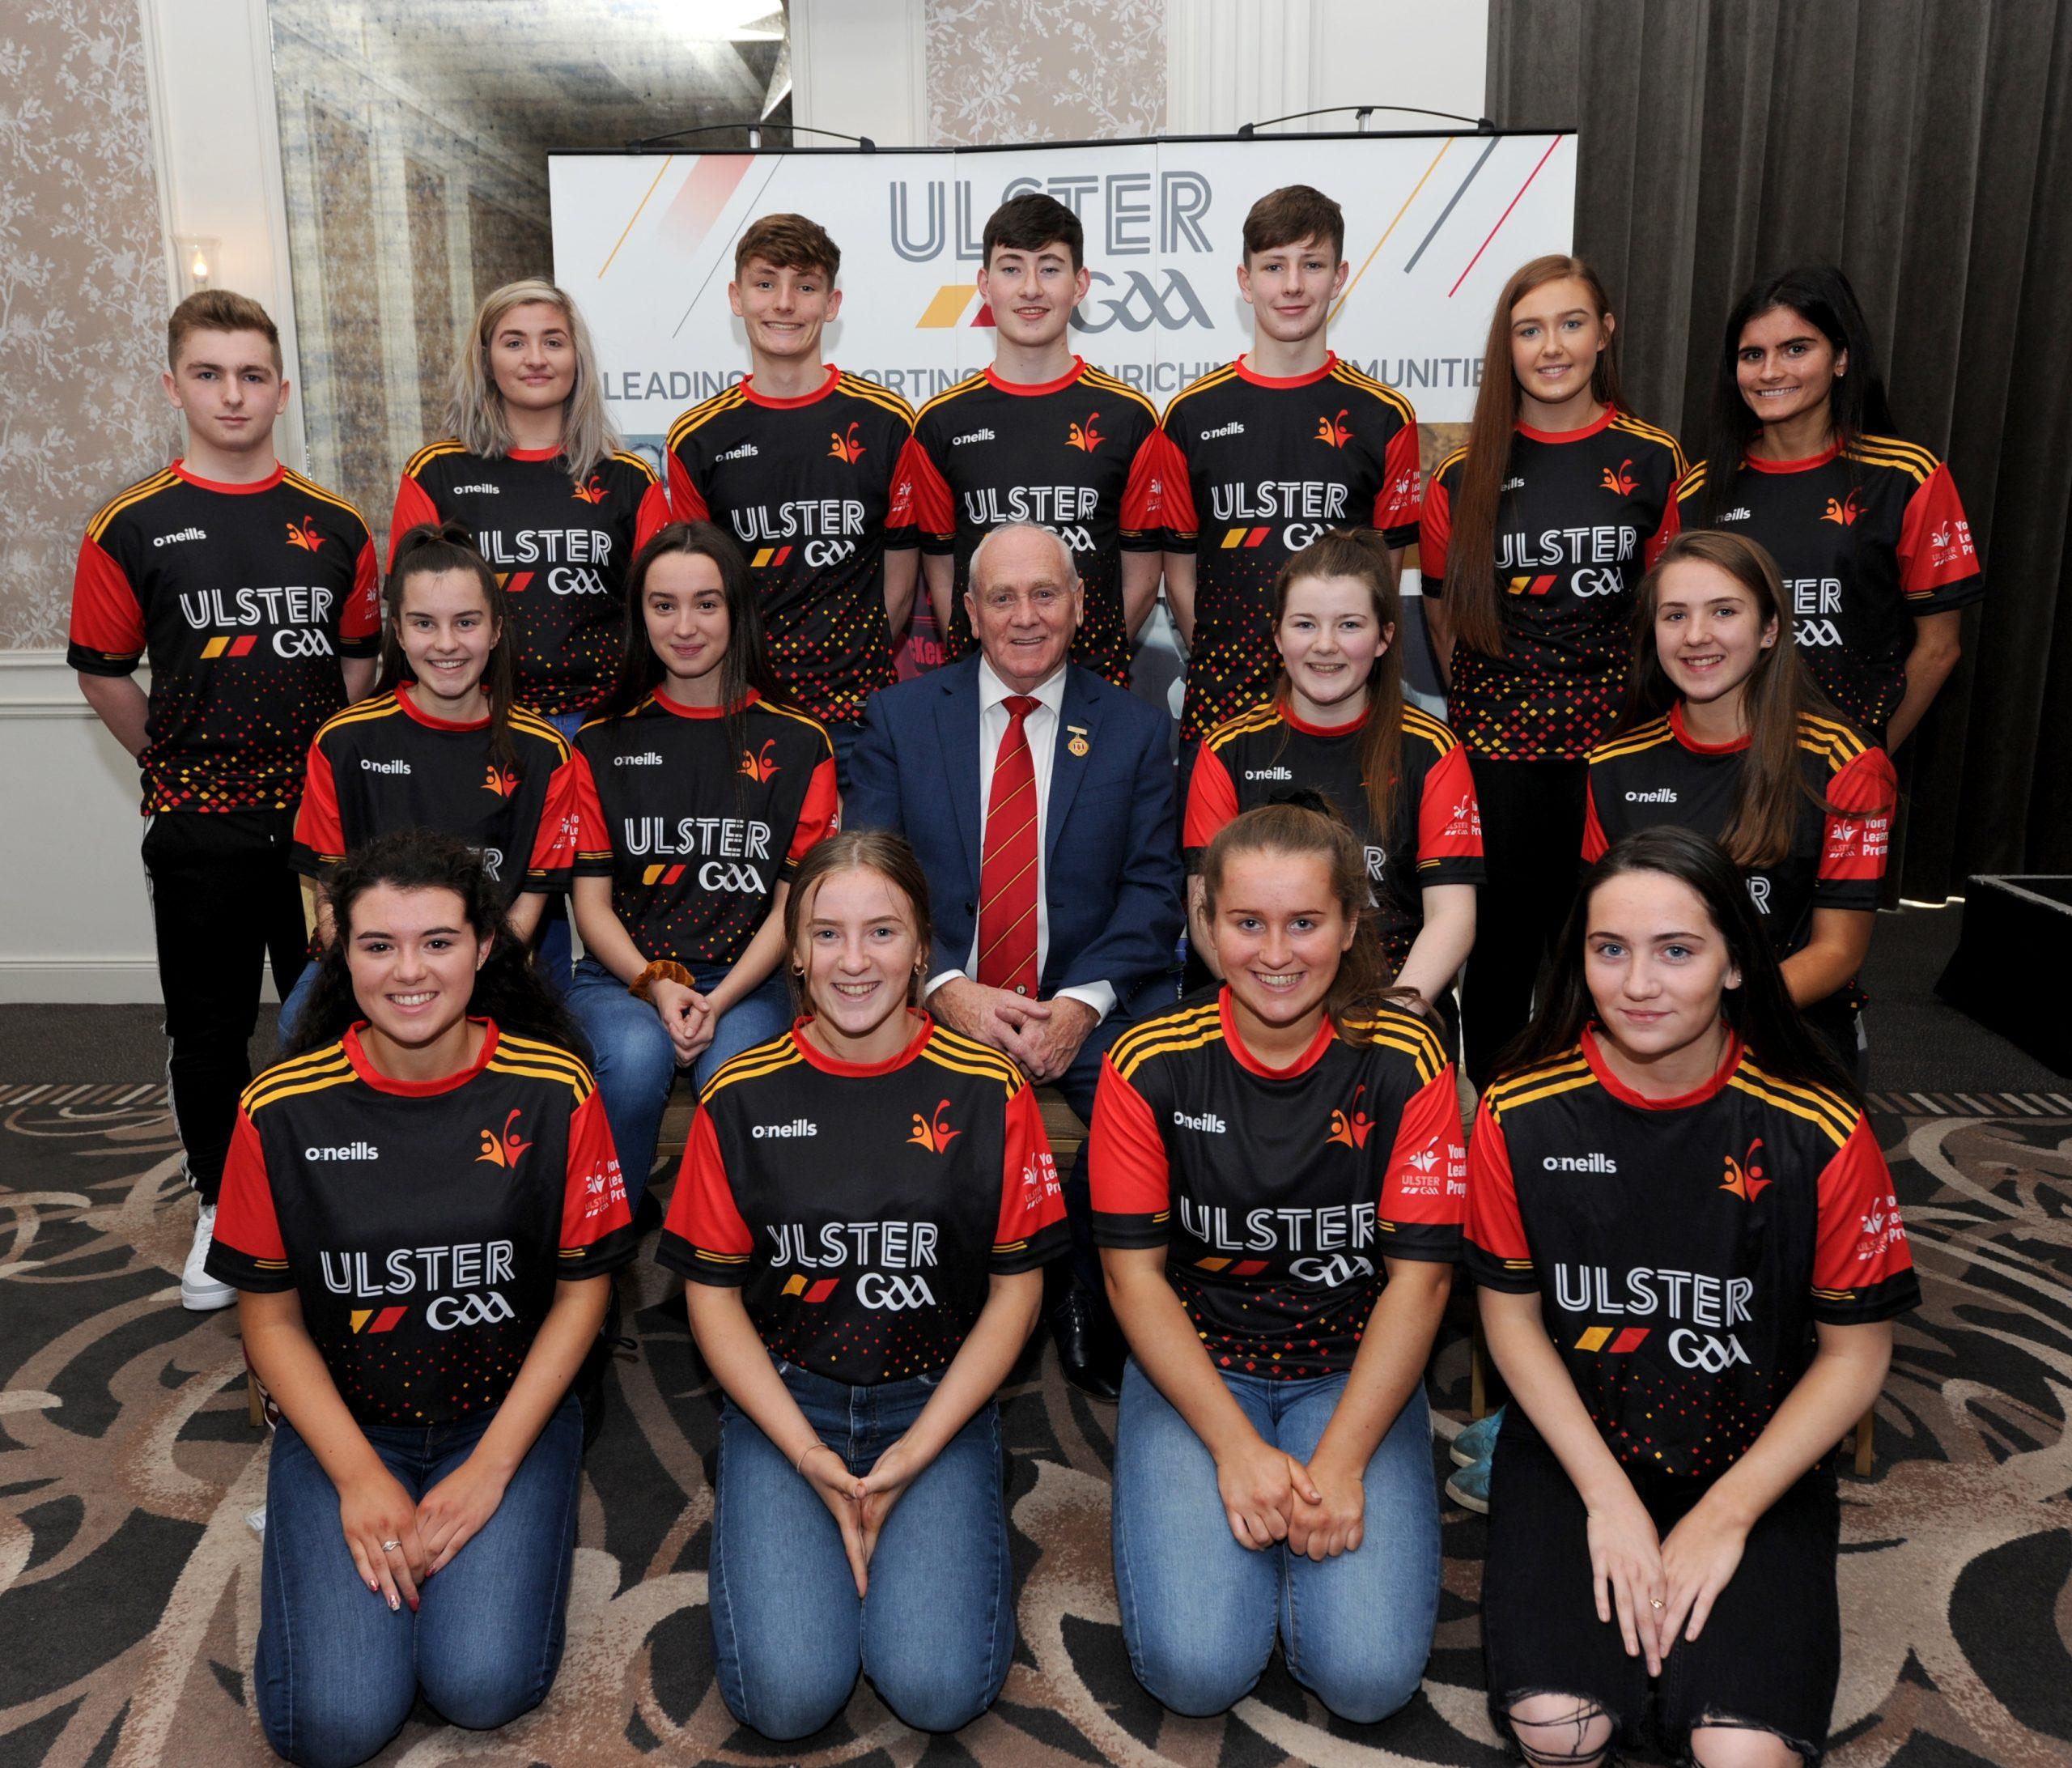 2019 Ulster GAA Young Leaders Graduation